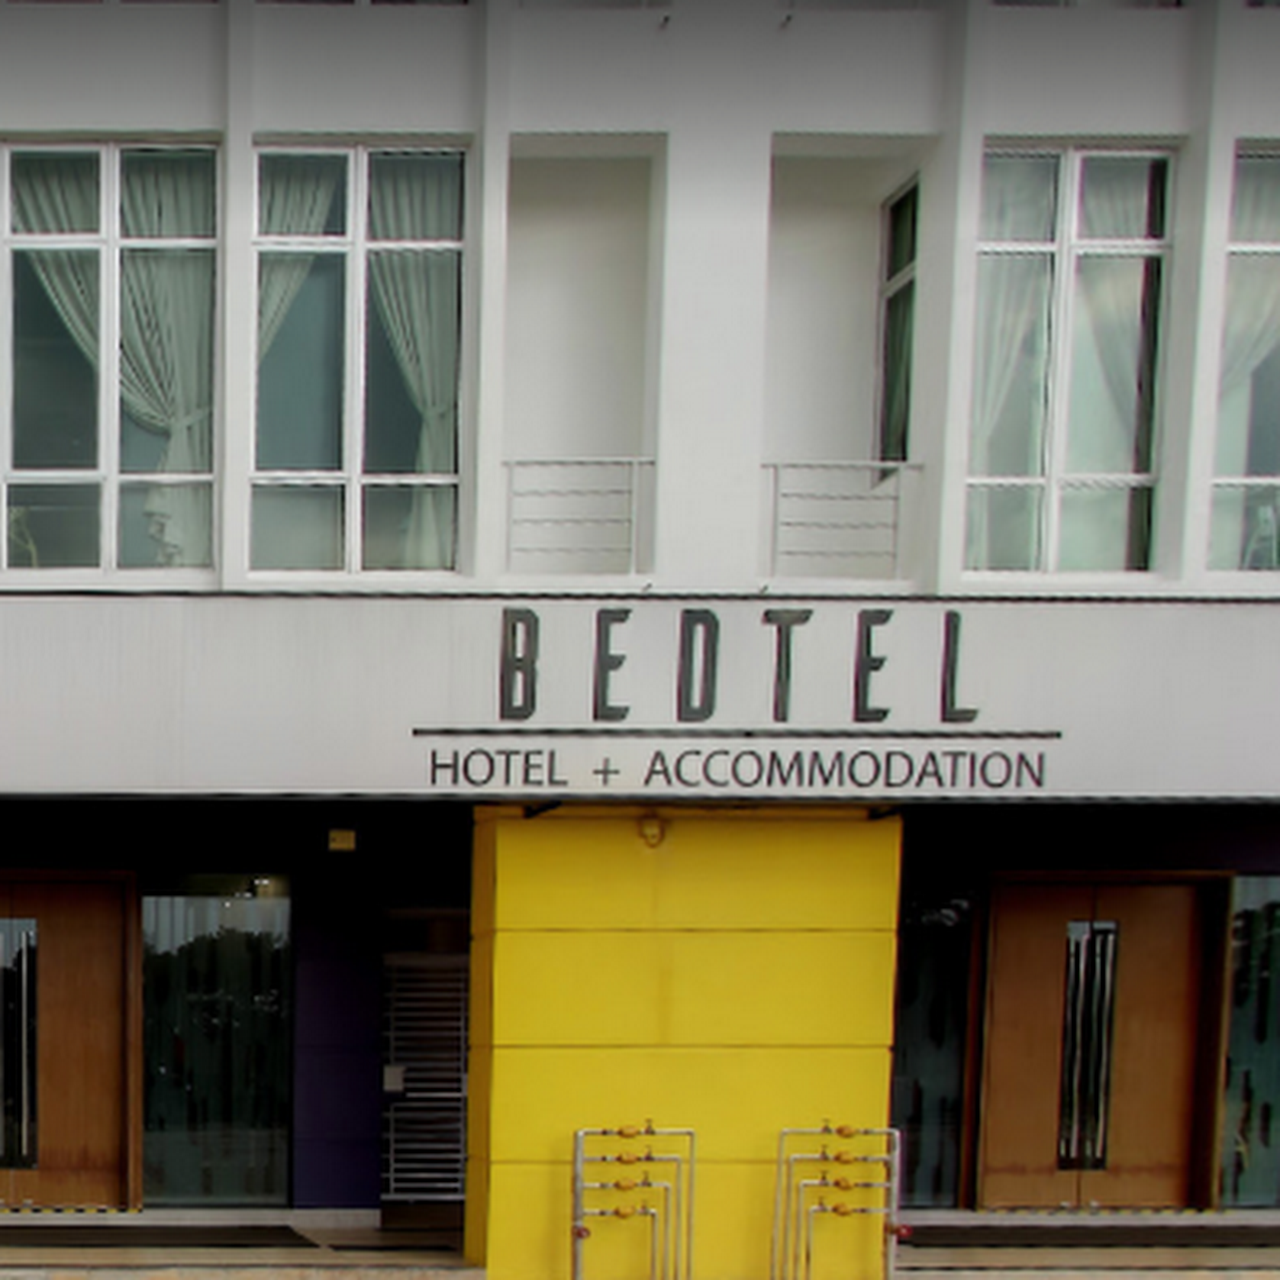 Image result for BEDTEL HOTEL & ACCOMMODATION